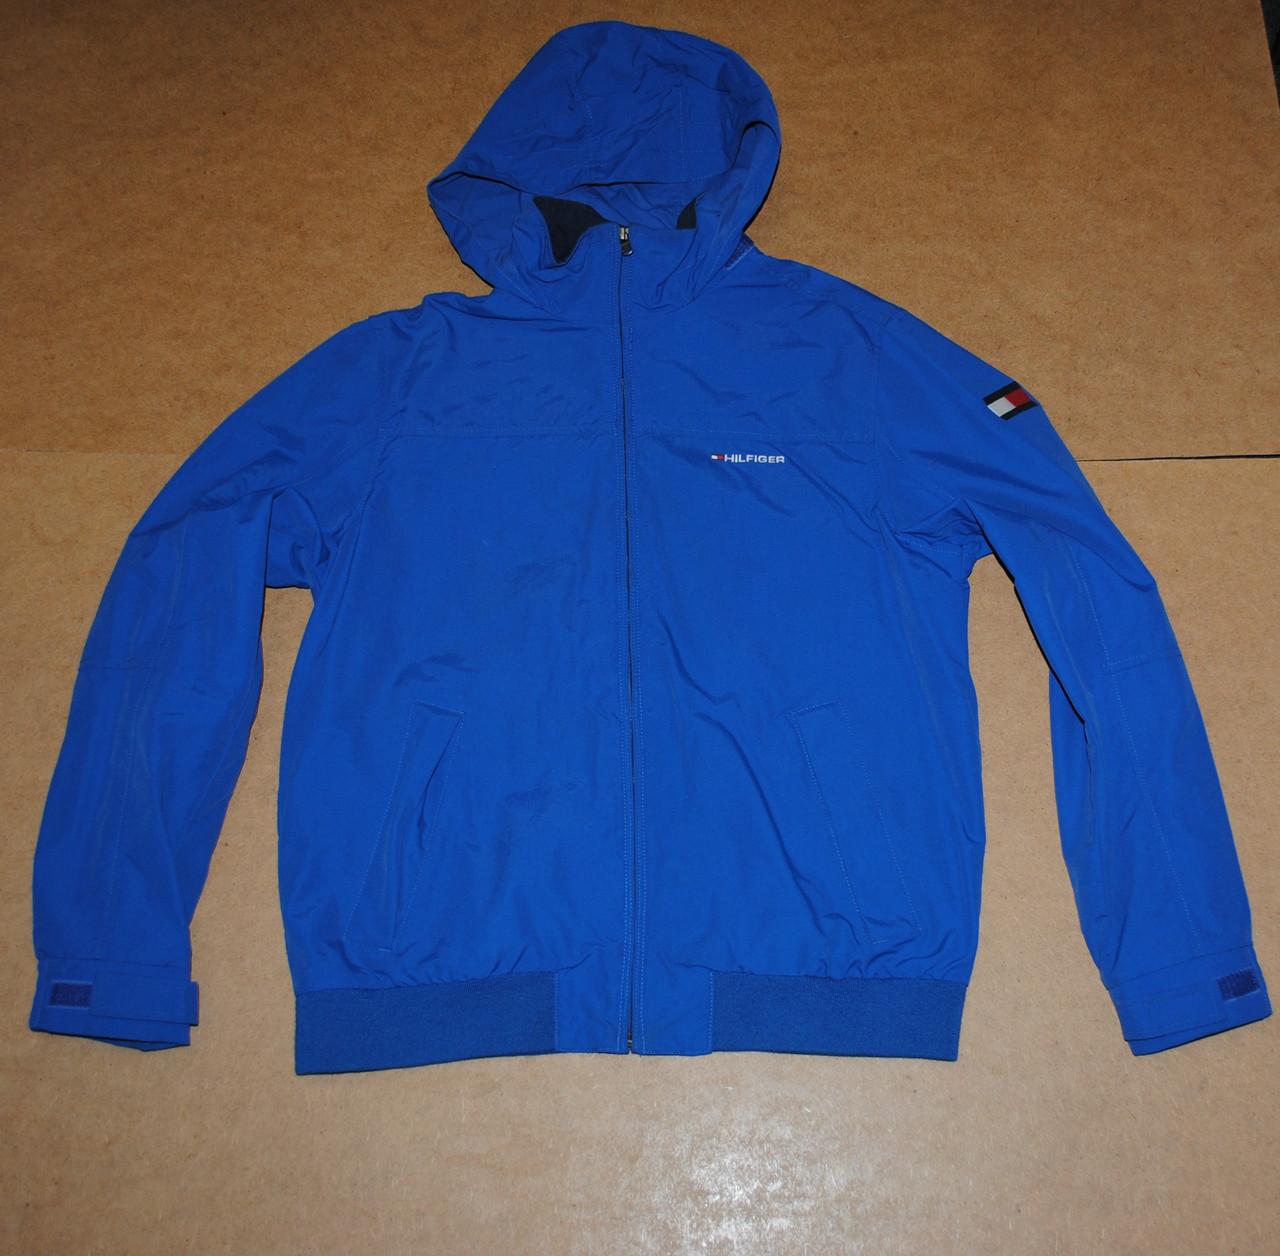 Tommy hilfiger куртка синего цвета ca03a8fc78086